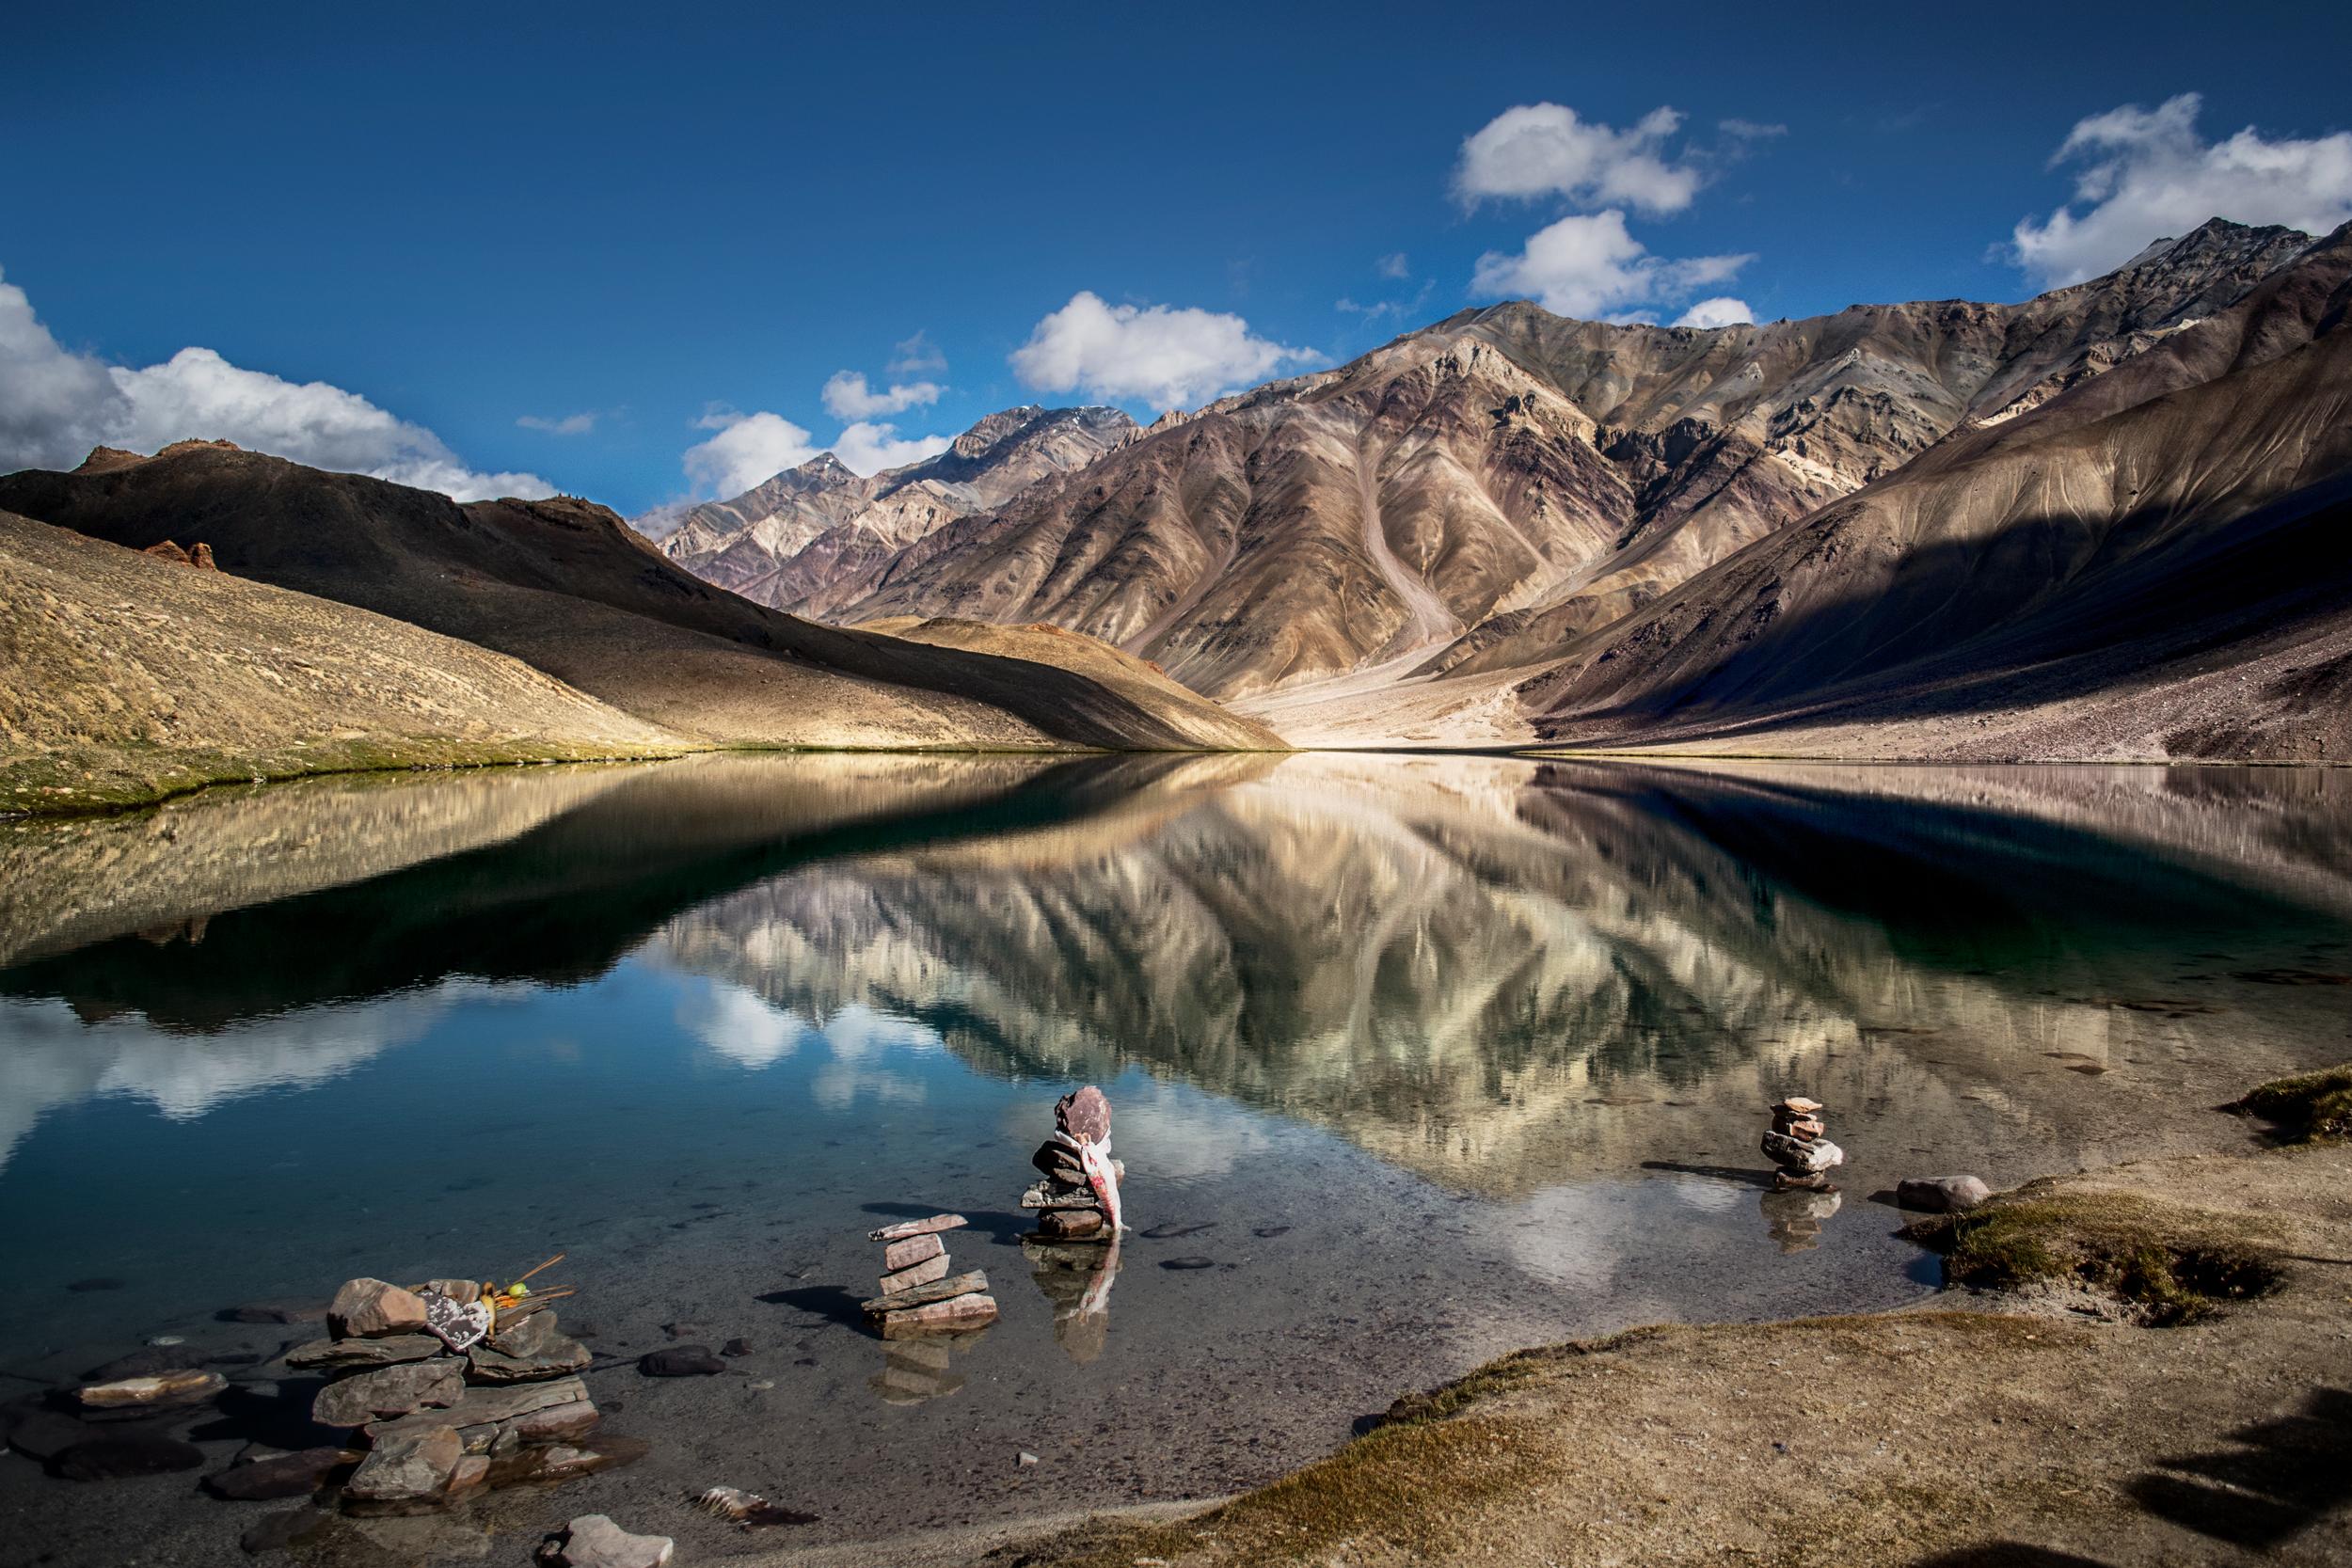 Reflection of mountains on Chandratal Lake